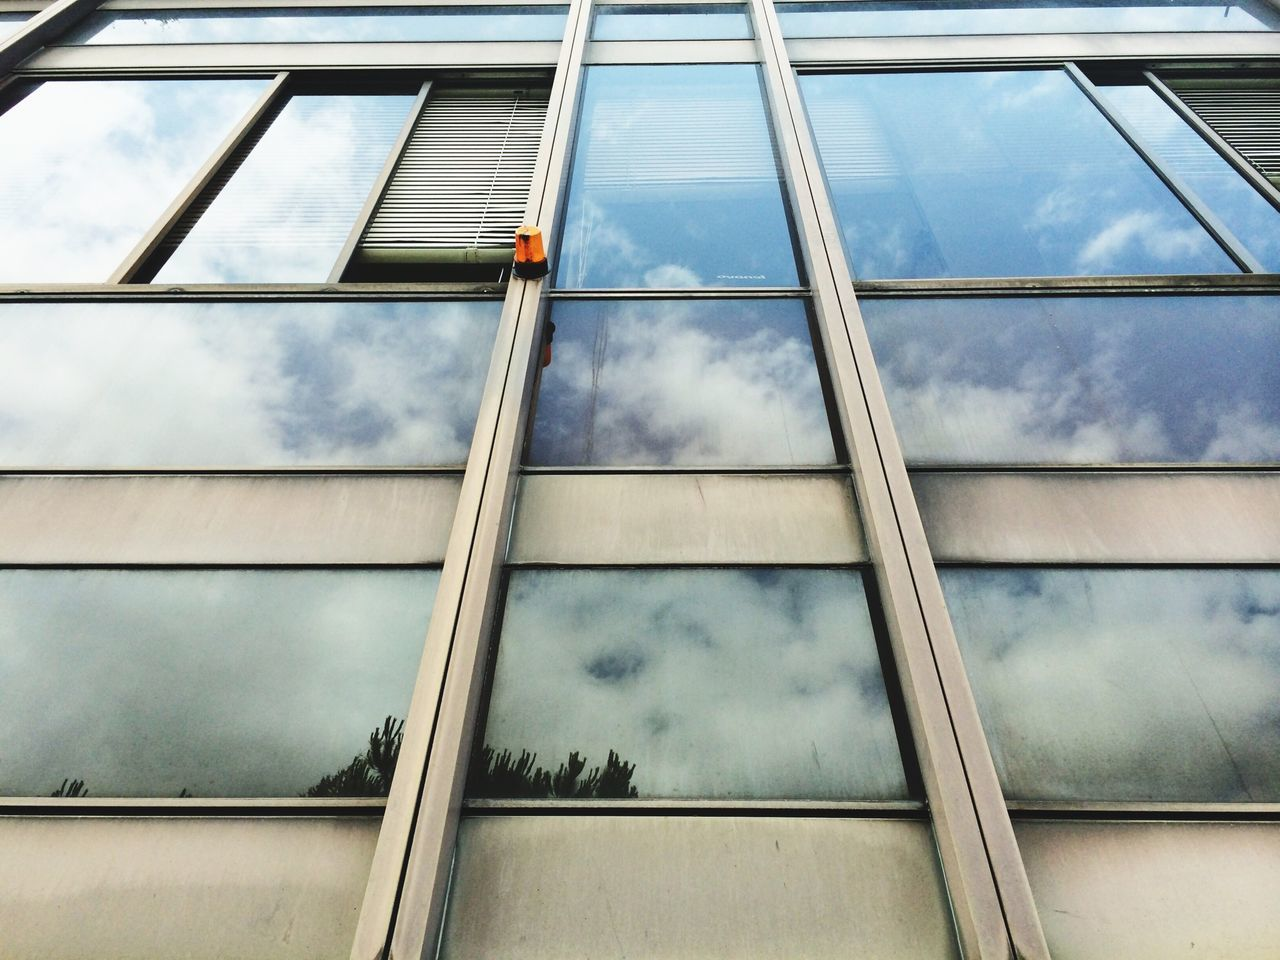 Windows with alarm Windows Alarm Italy Reflection